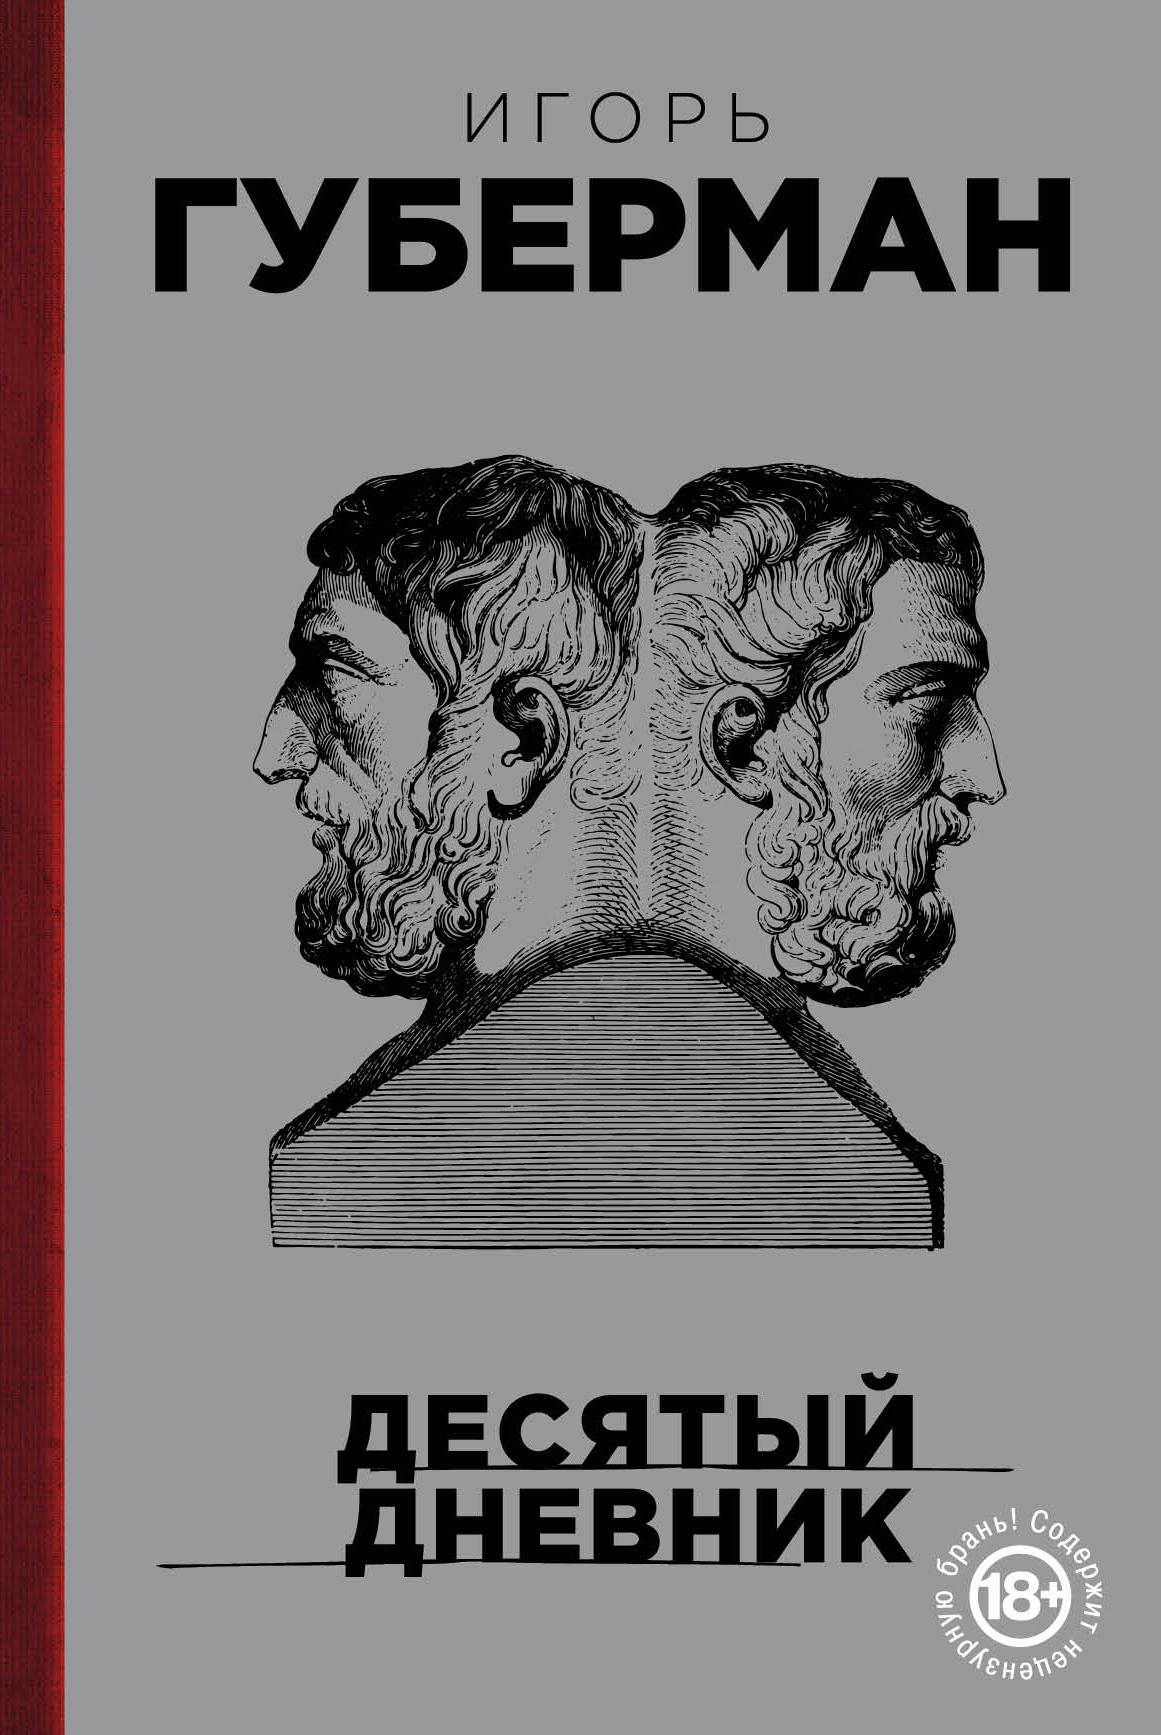 desyatyy dnevnik